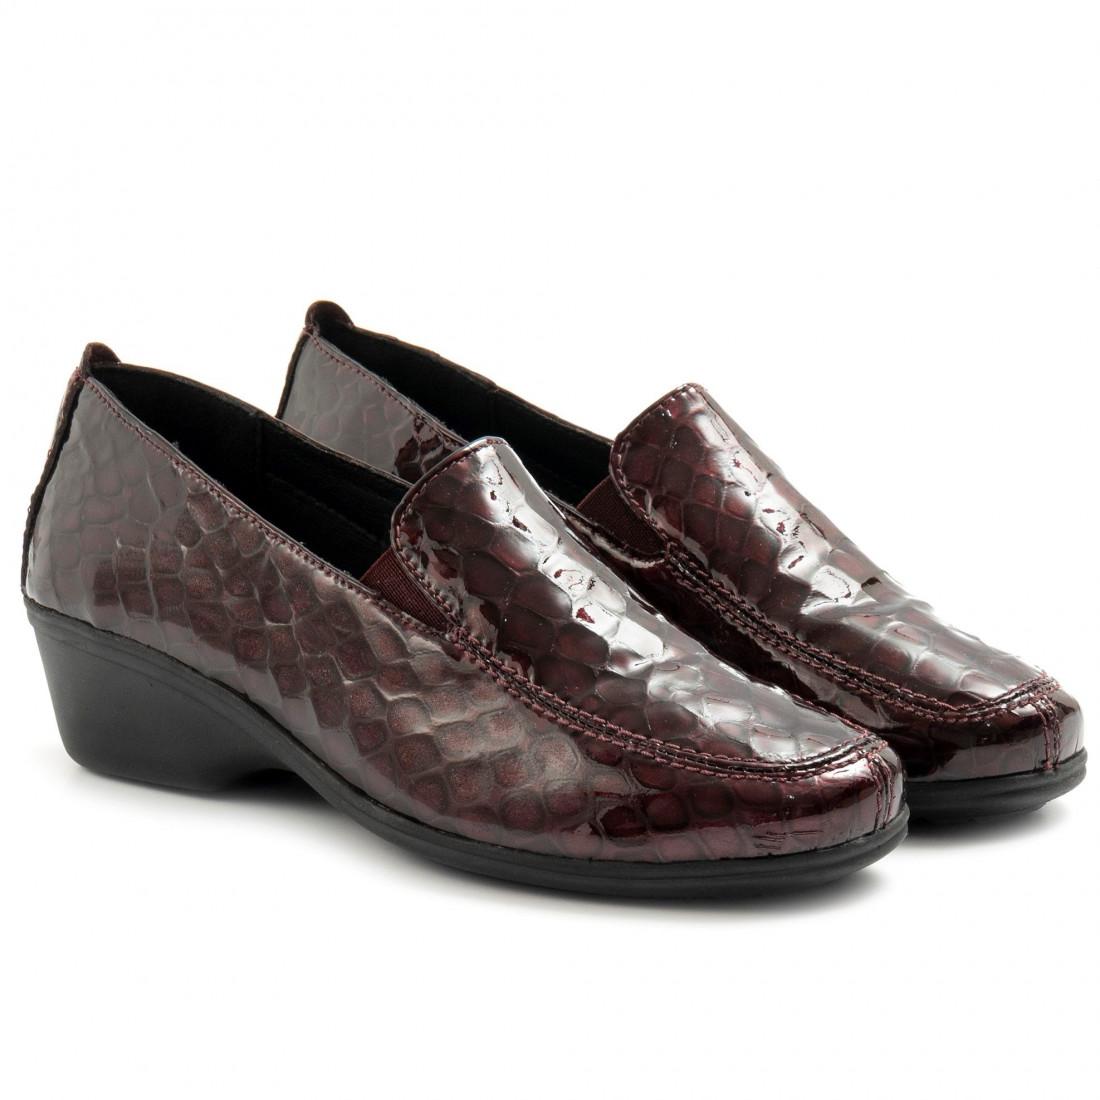 loafers woman cinzia soft iv13595 gp002 7944